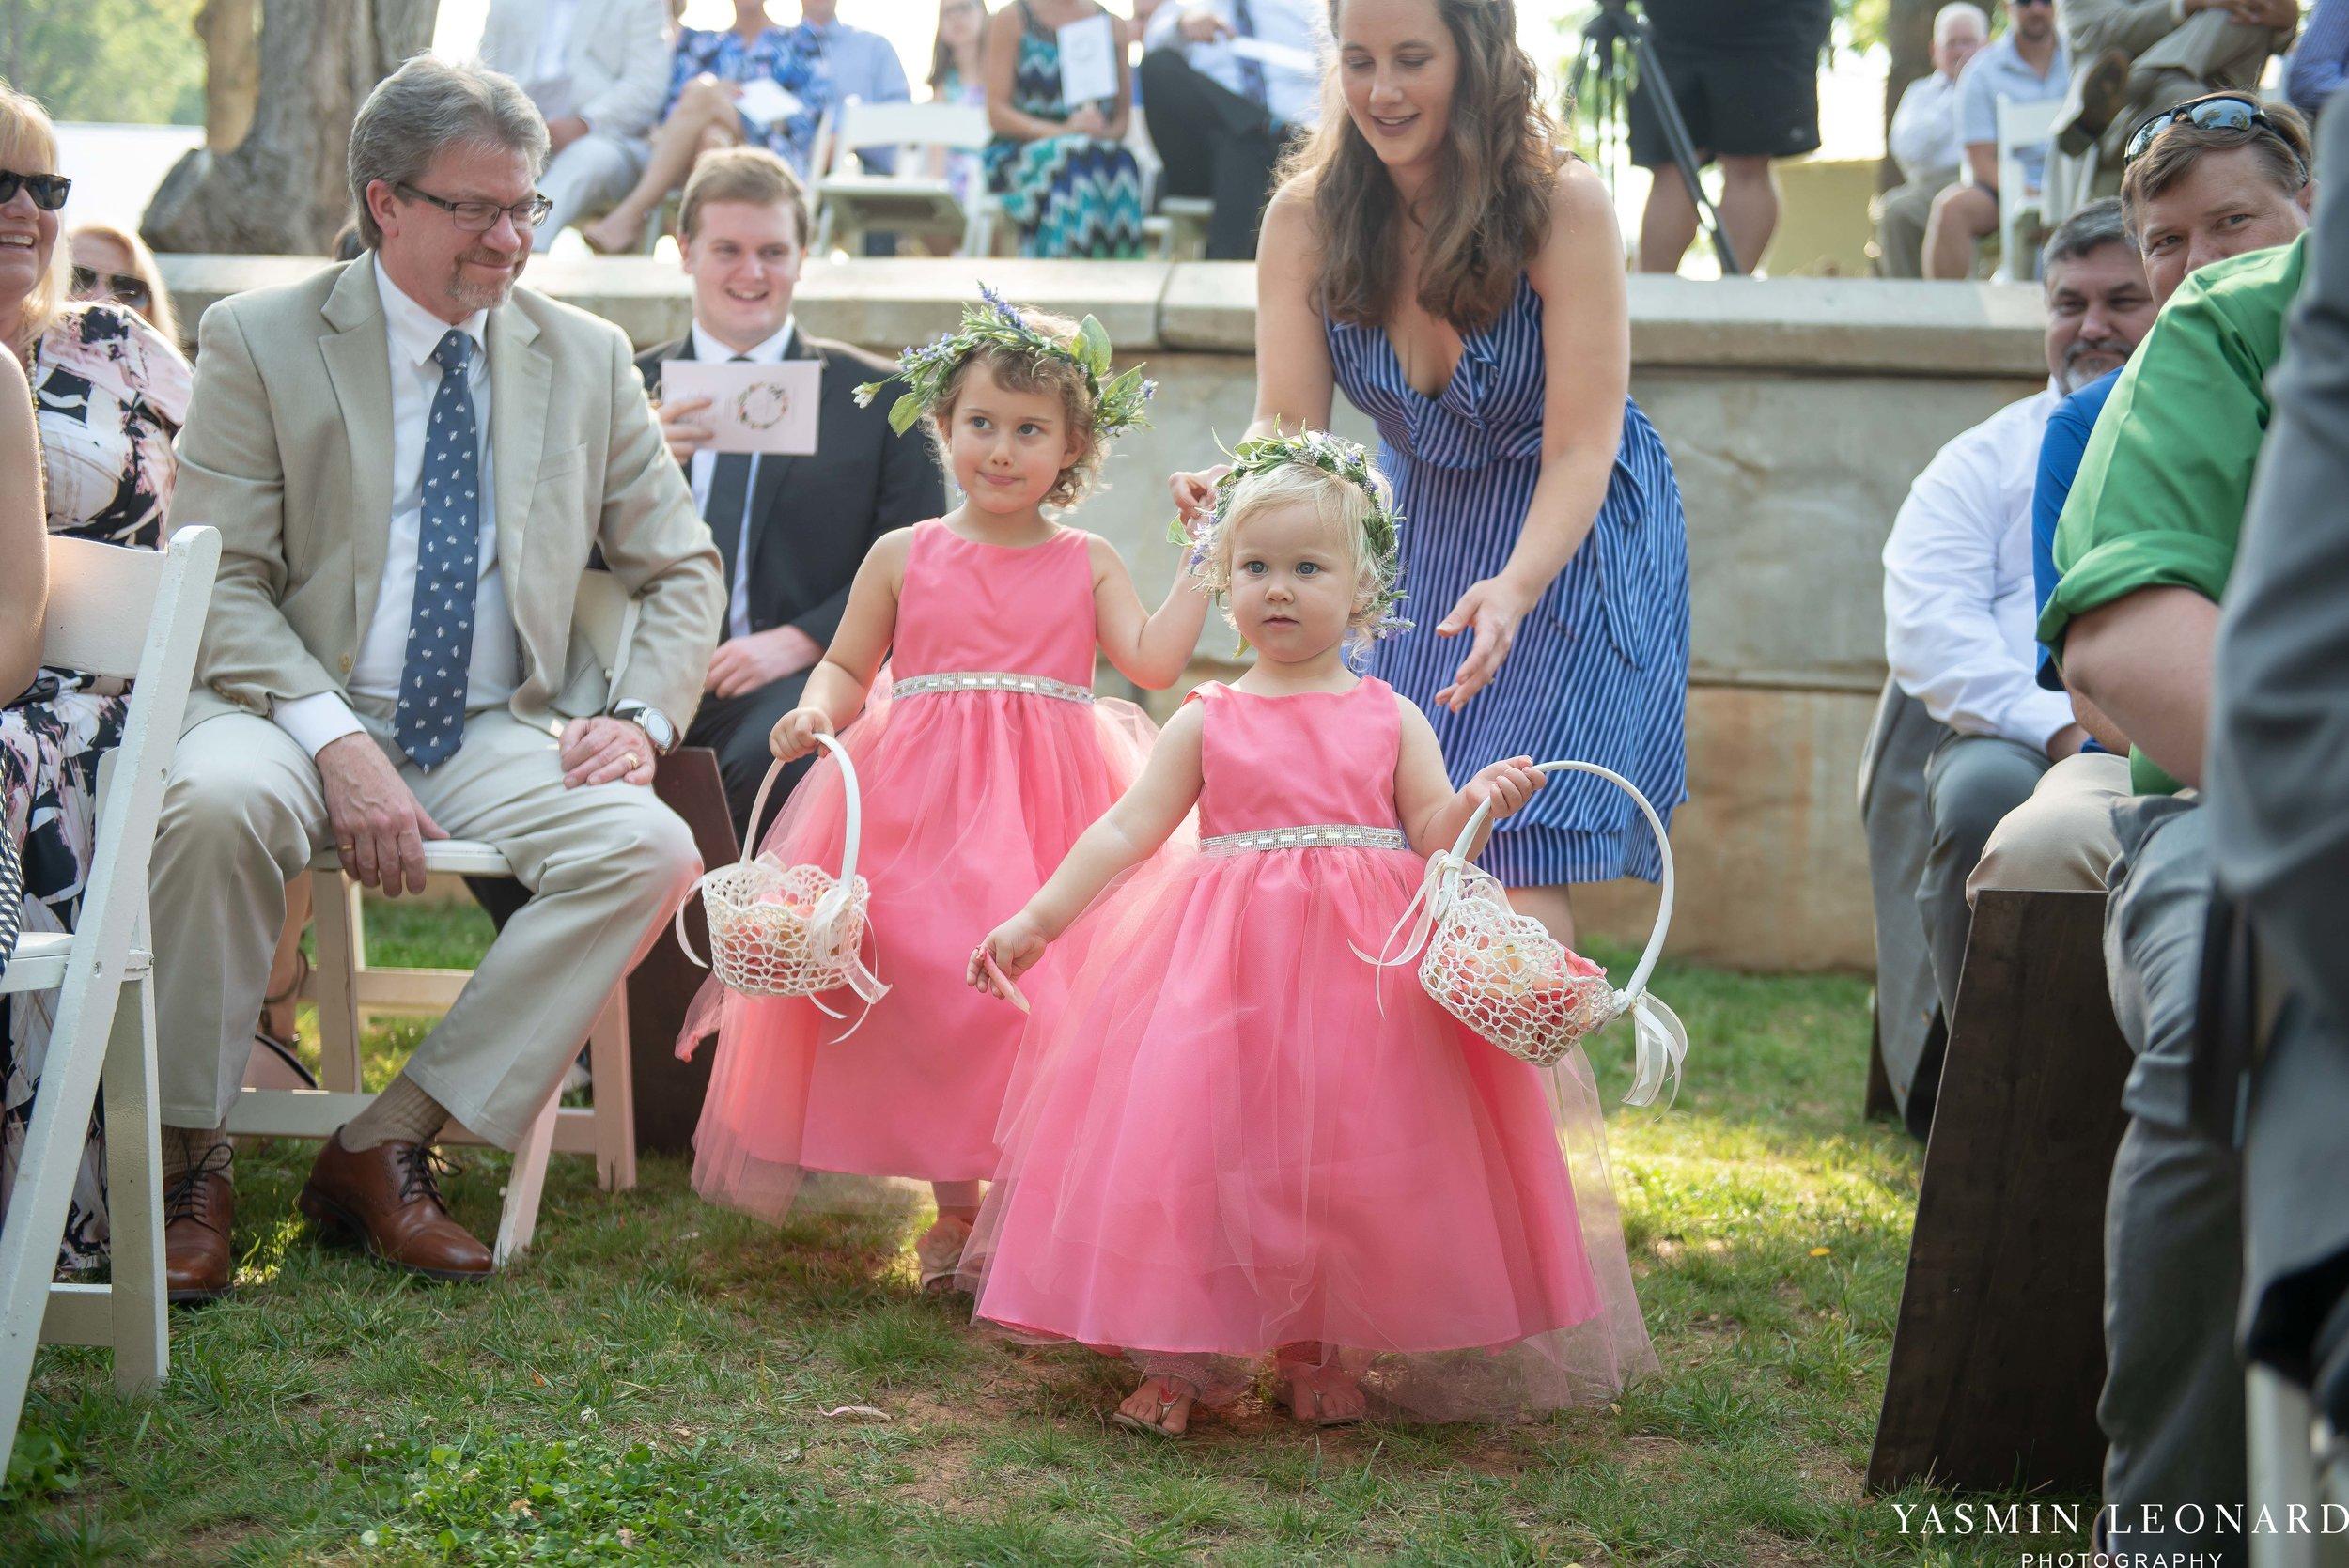 Old Homeplace Vineyard - NC Weddings - Outdoor Summer Weddings - Peony Boutique - Vineyard Wedding - NC Photographer - Yasmin Leonard Photography-24.jpg